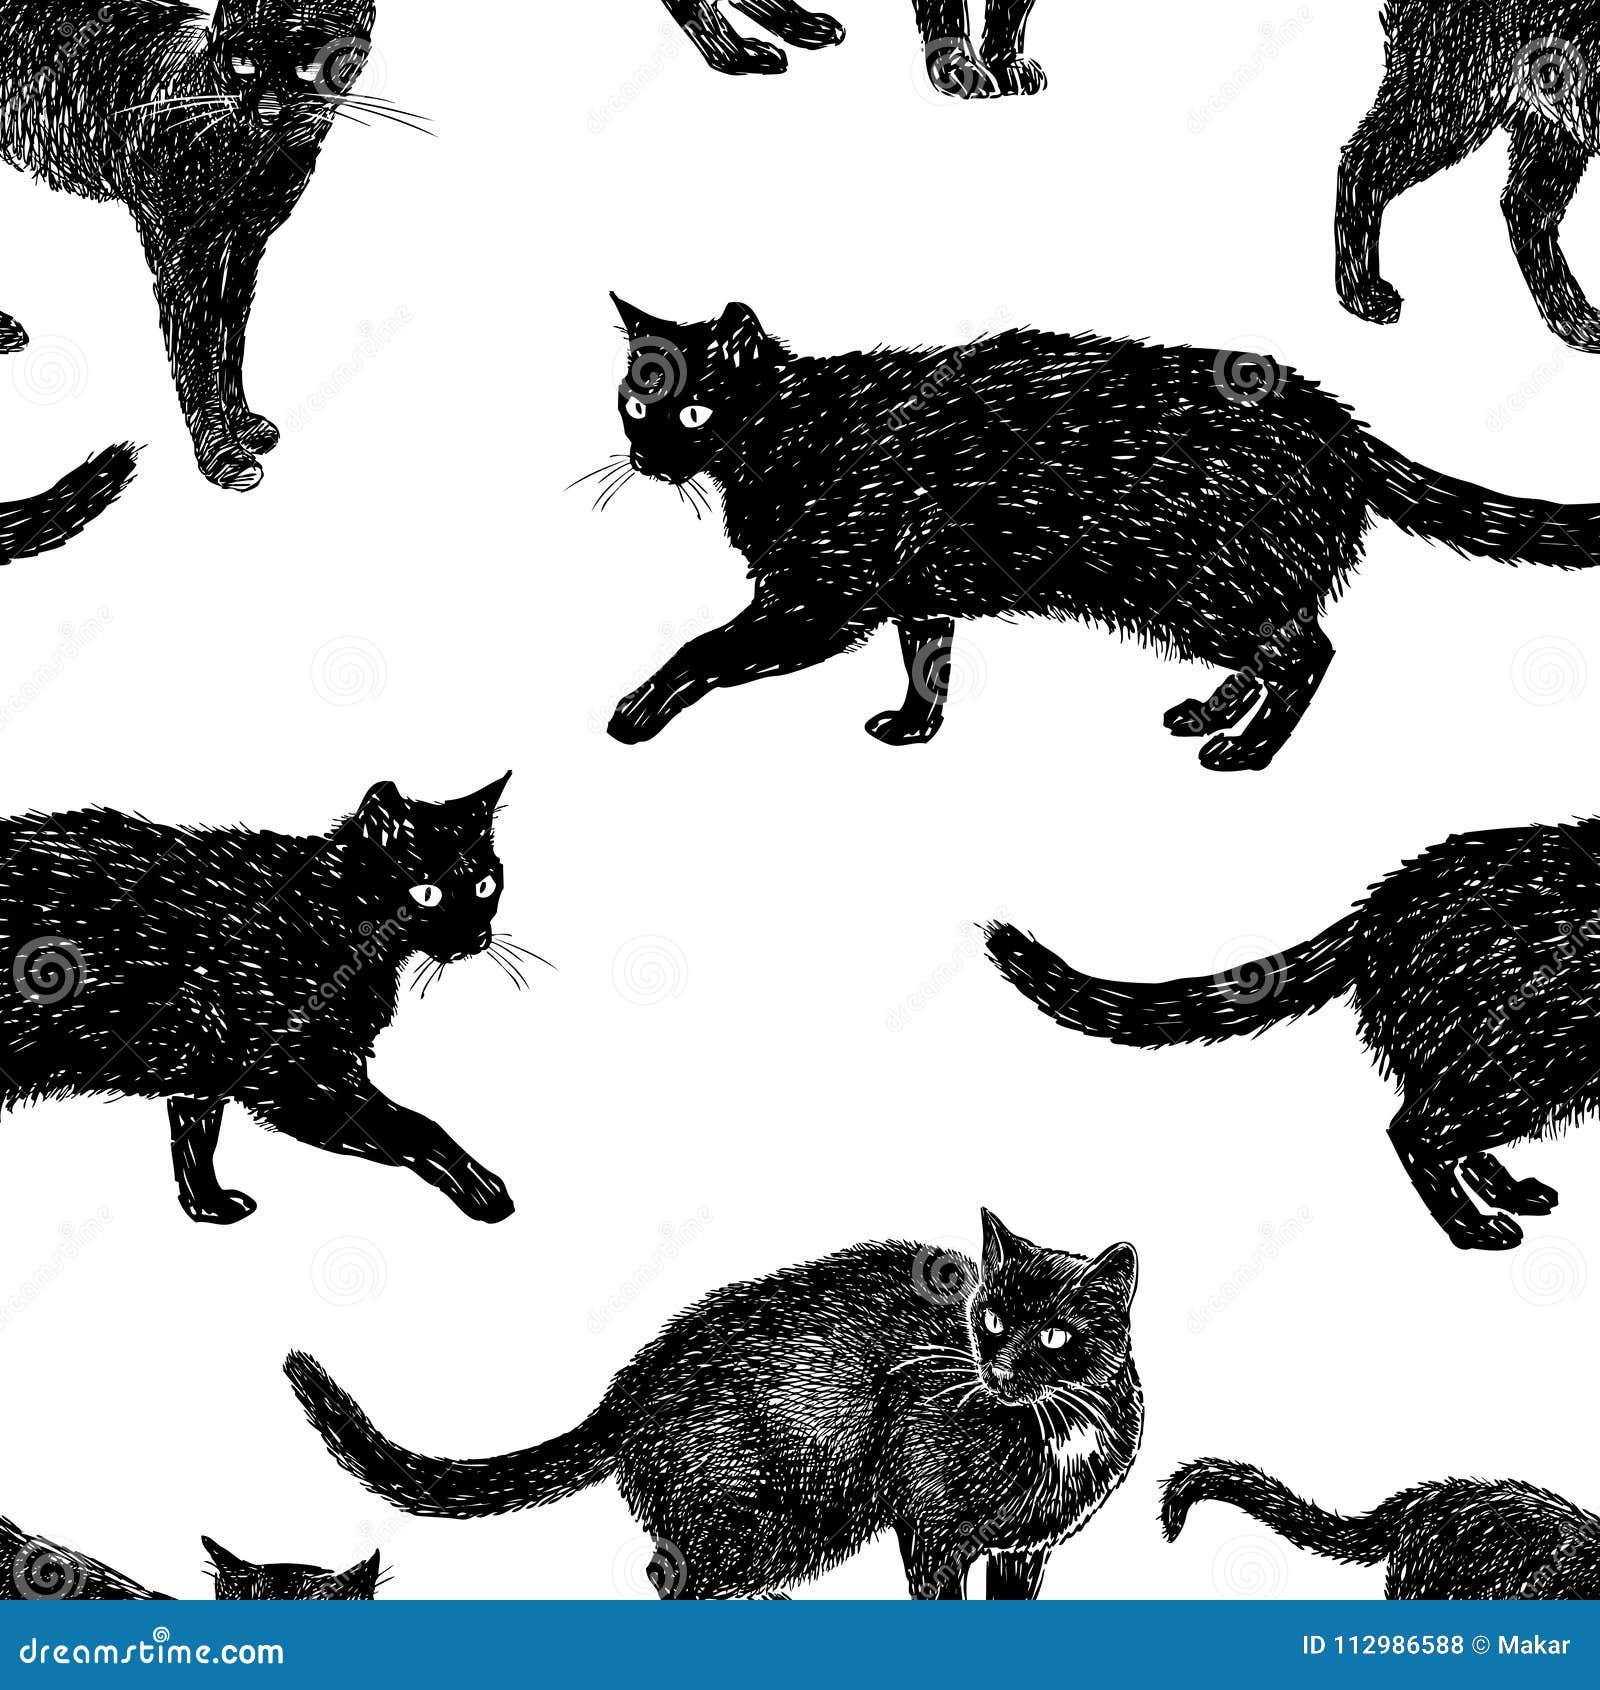 Pattern of drawn black cats